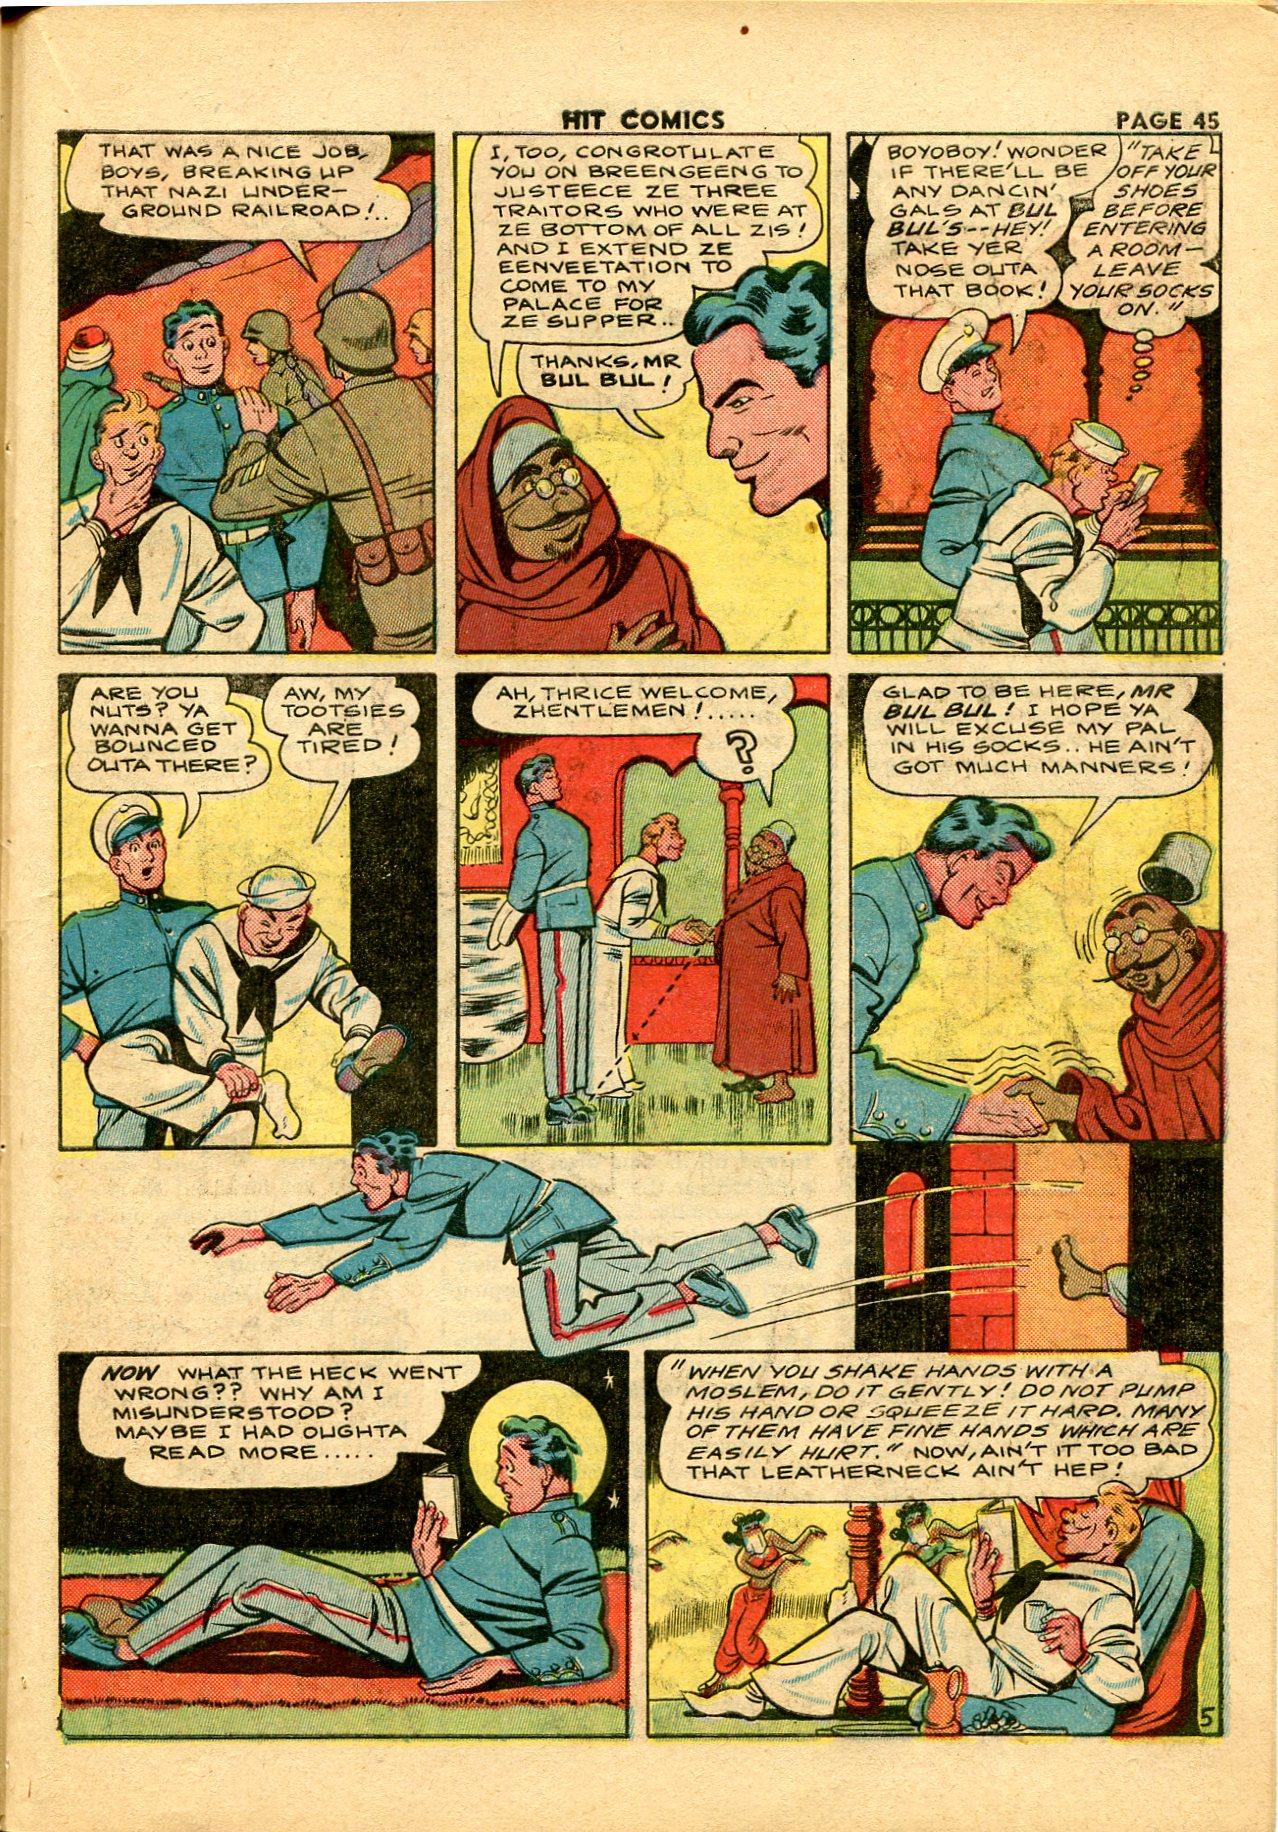 Read online Hit Comics comic -  Issue #28 - 48